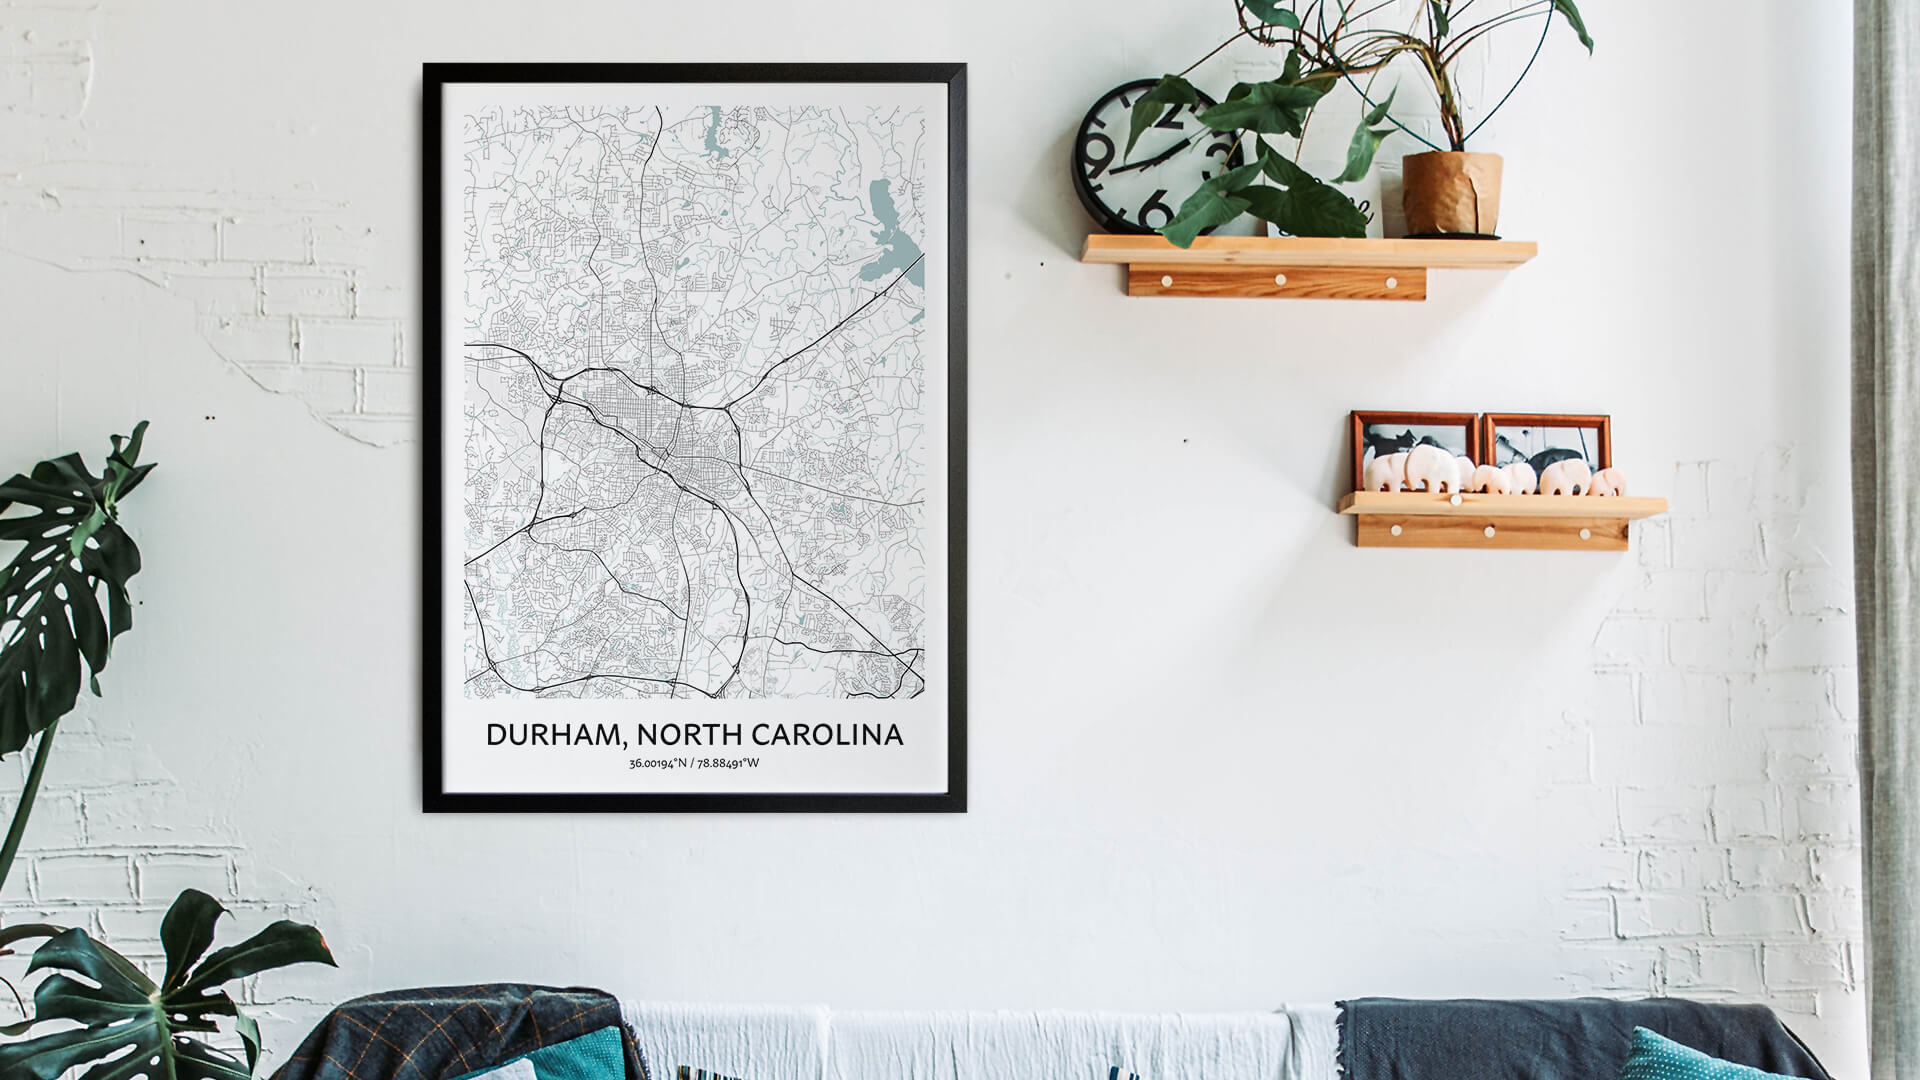 Durham North Carolina map art